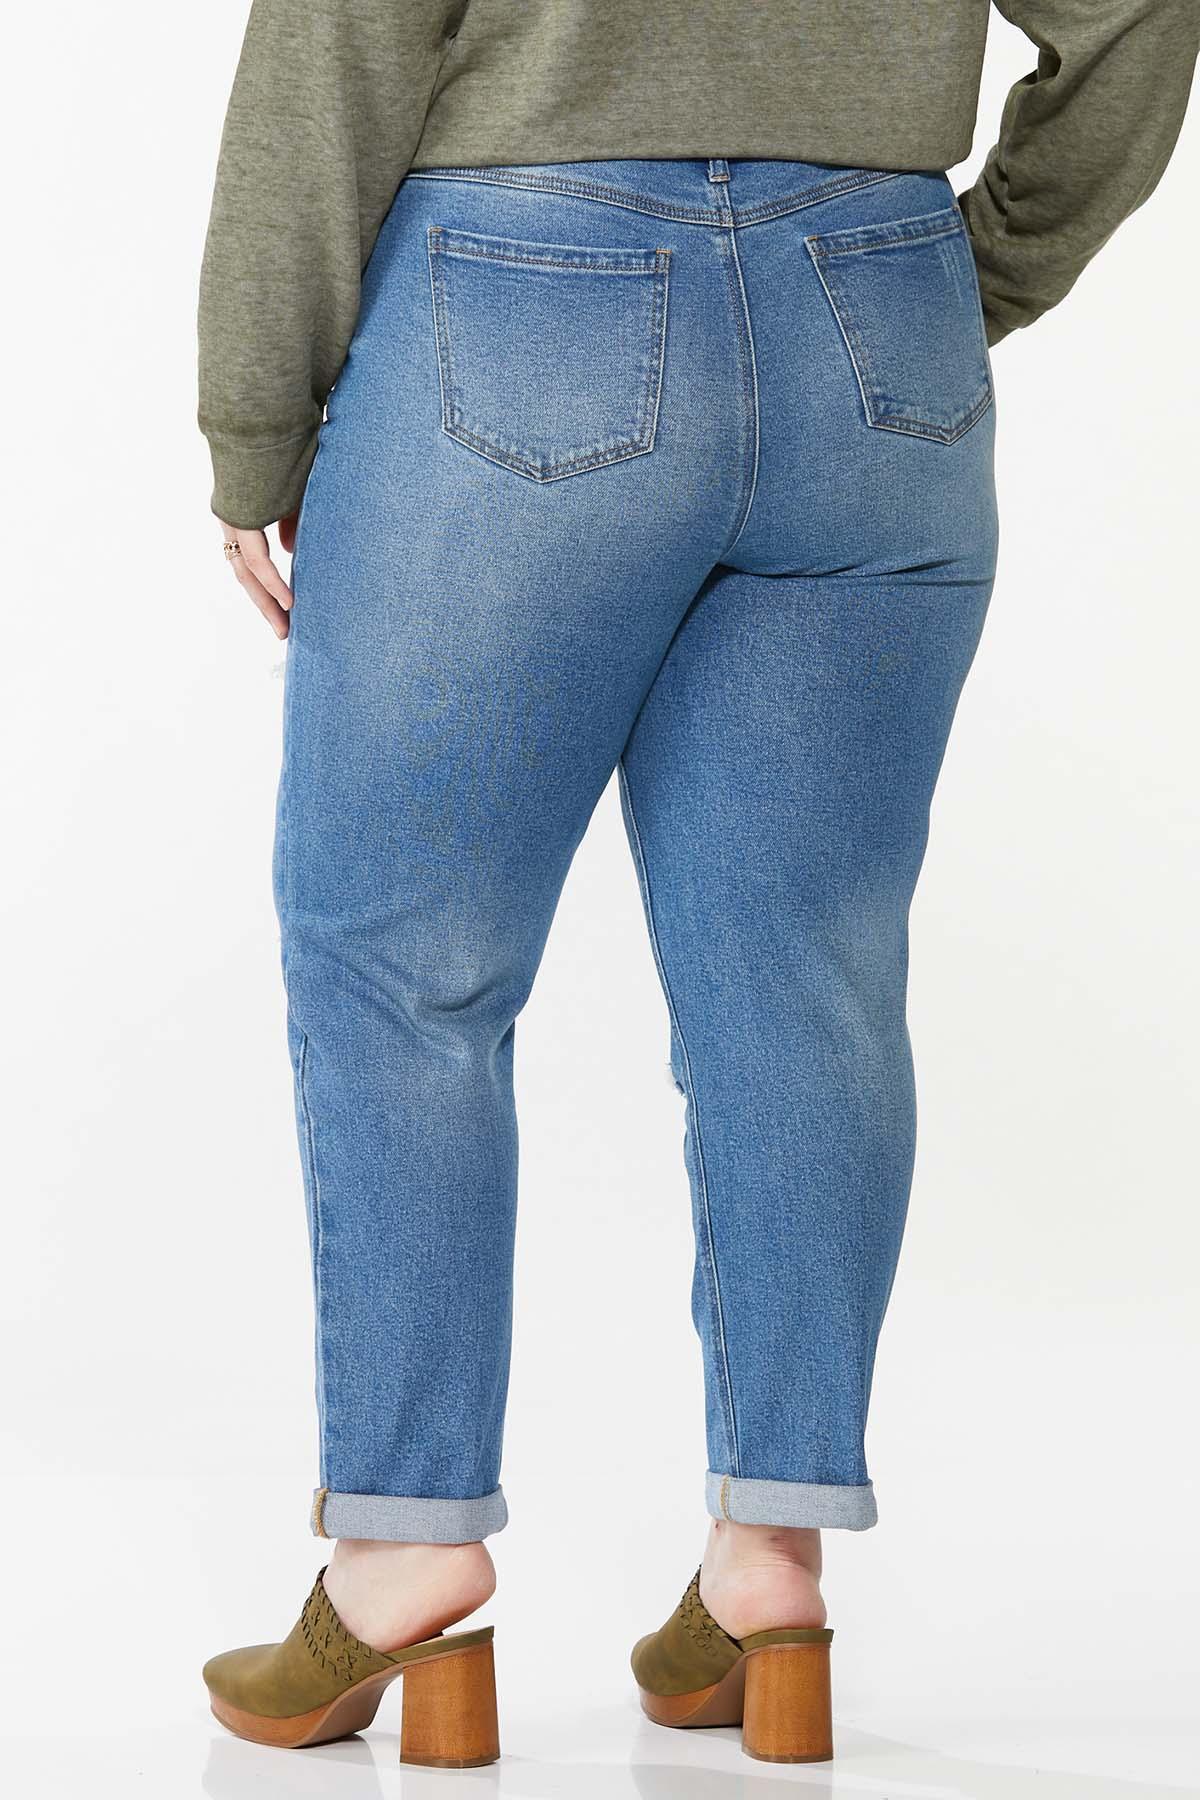 Plus Size Camo Rip Repair Boyfriend Jeans (Item #44702797)